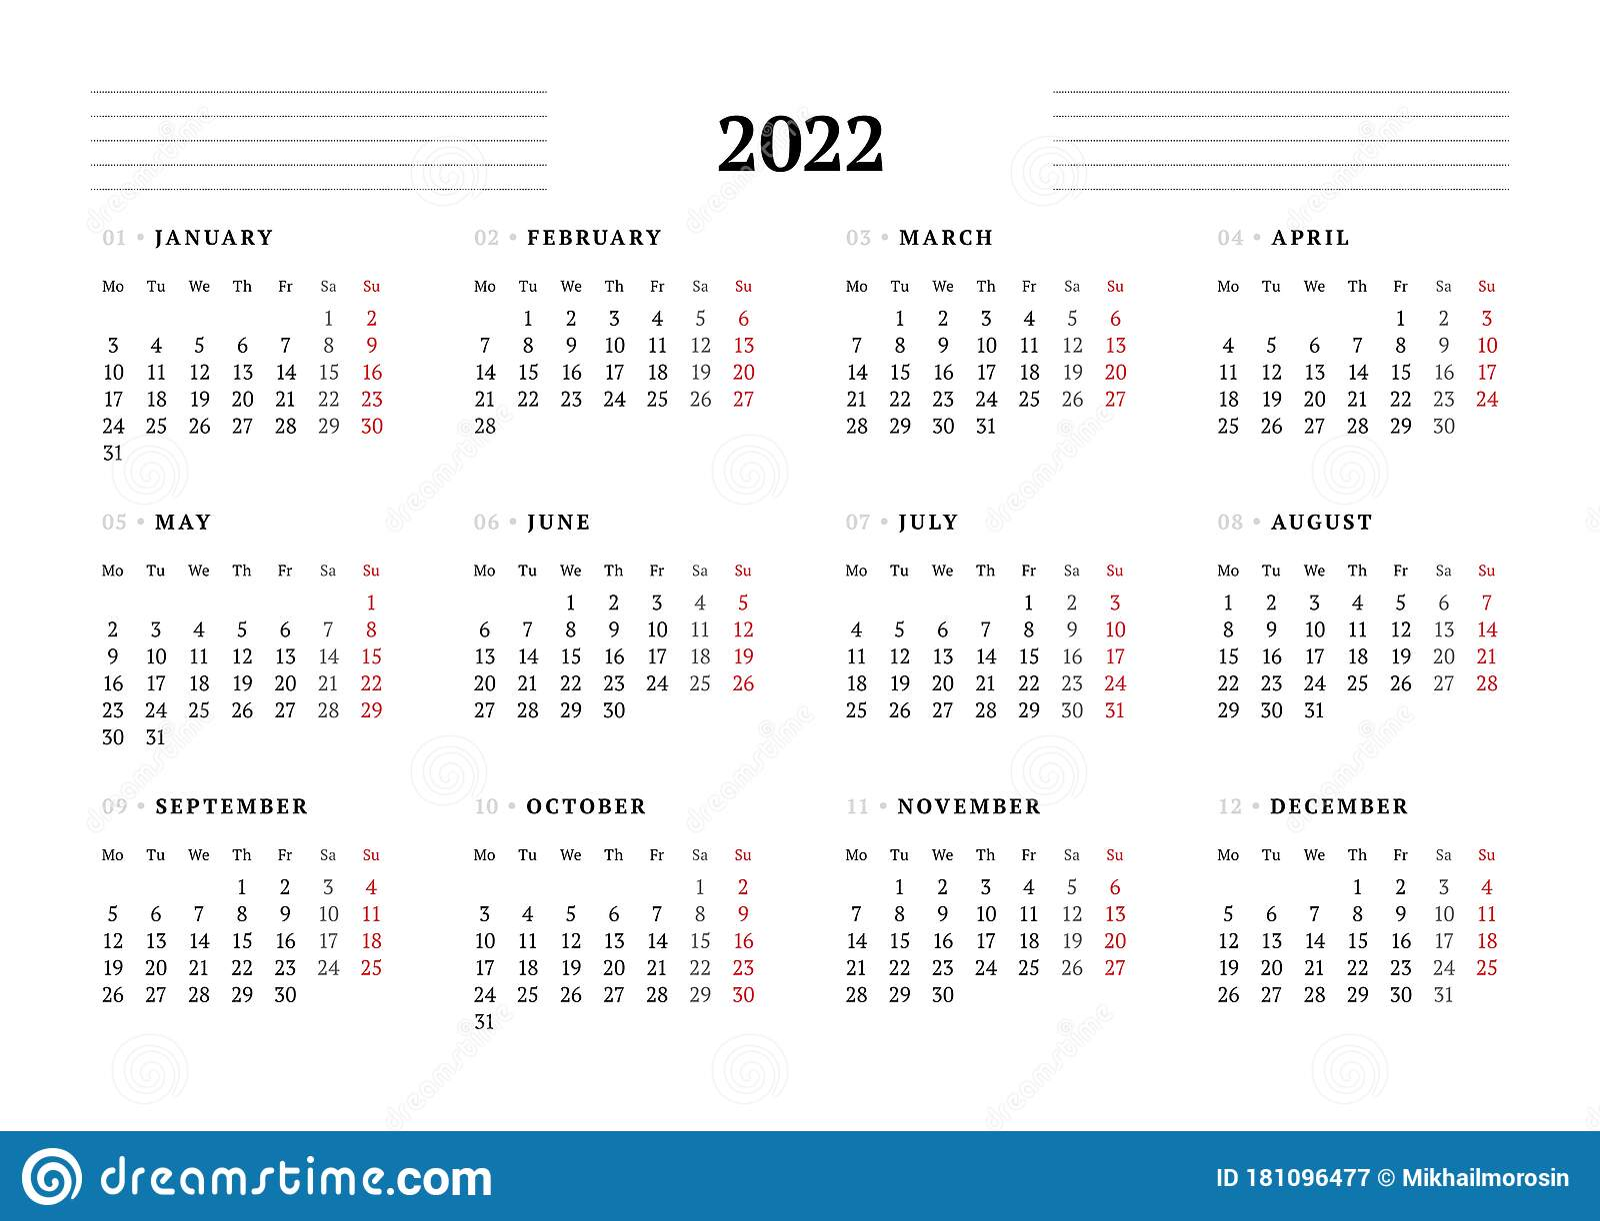 2022 Calendar Monday Start.Calendar Template For 2022 Year Stationery Design Week Starts On Monday Stock Illustration Illustration Of Landscape Paper 181096477